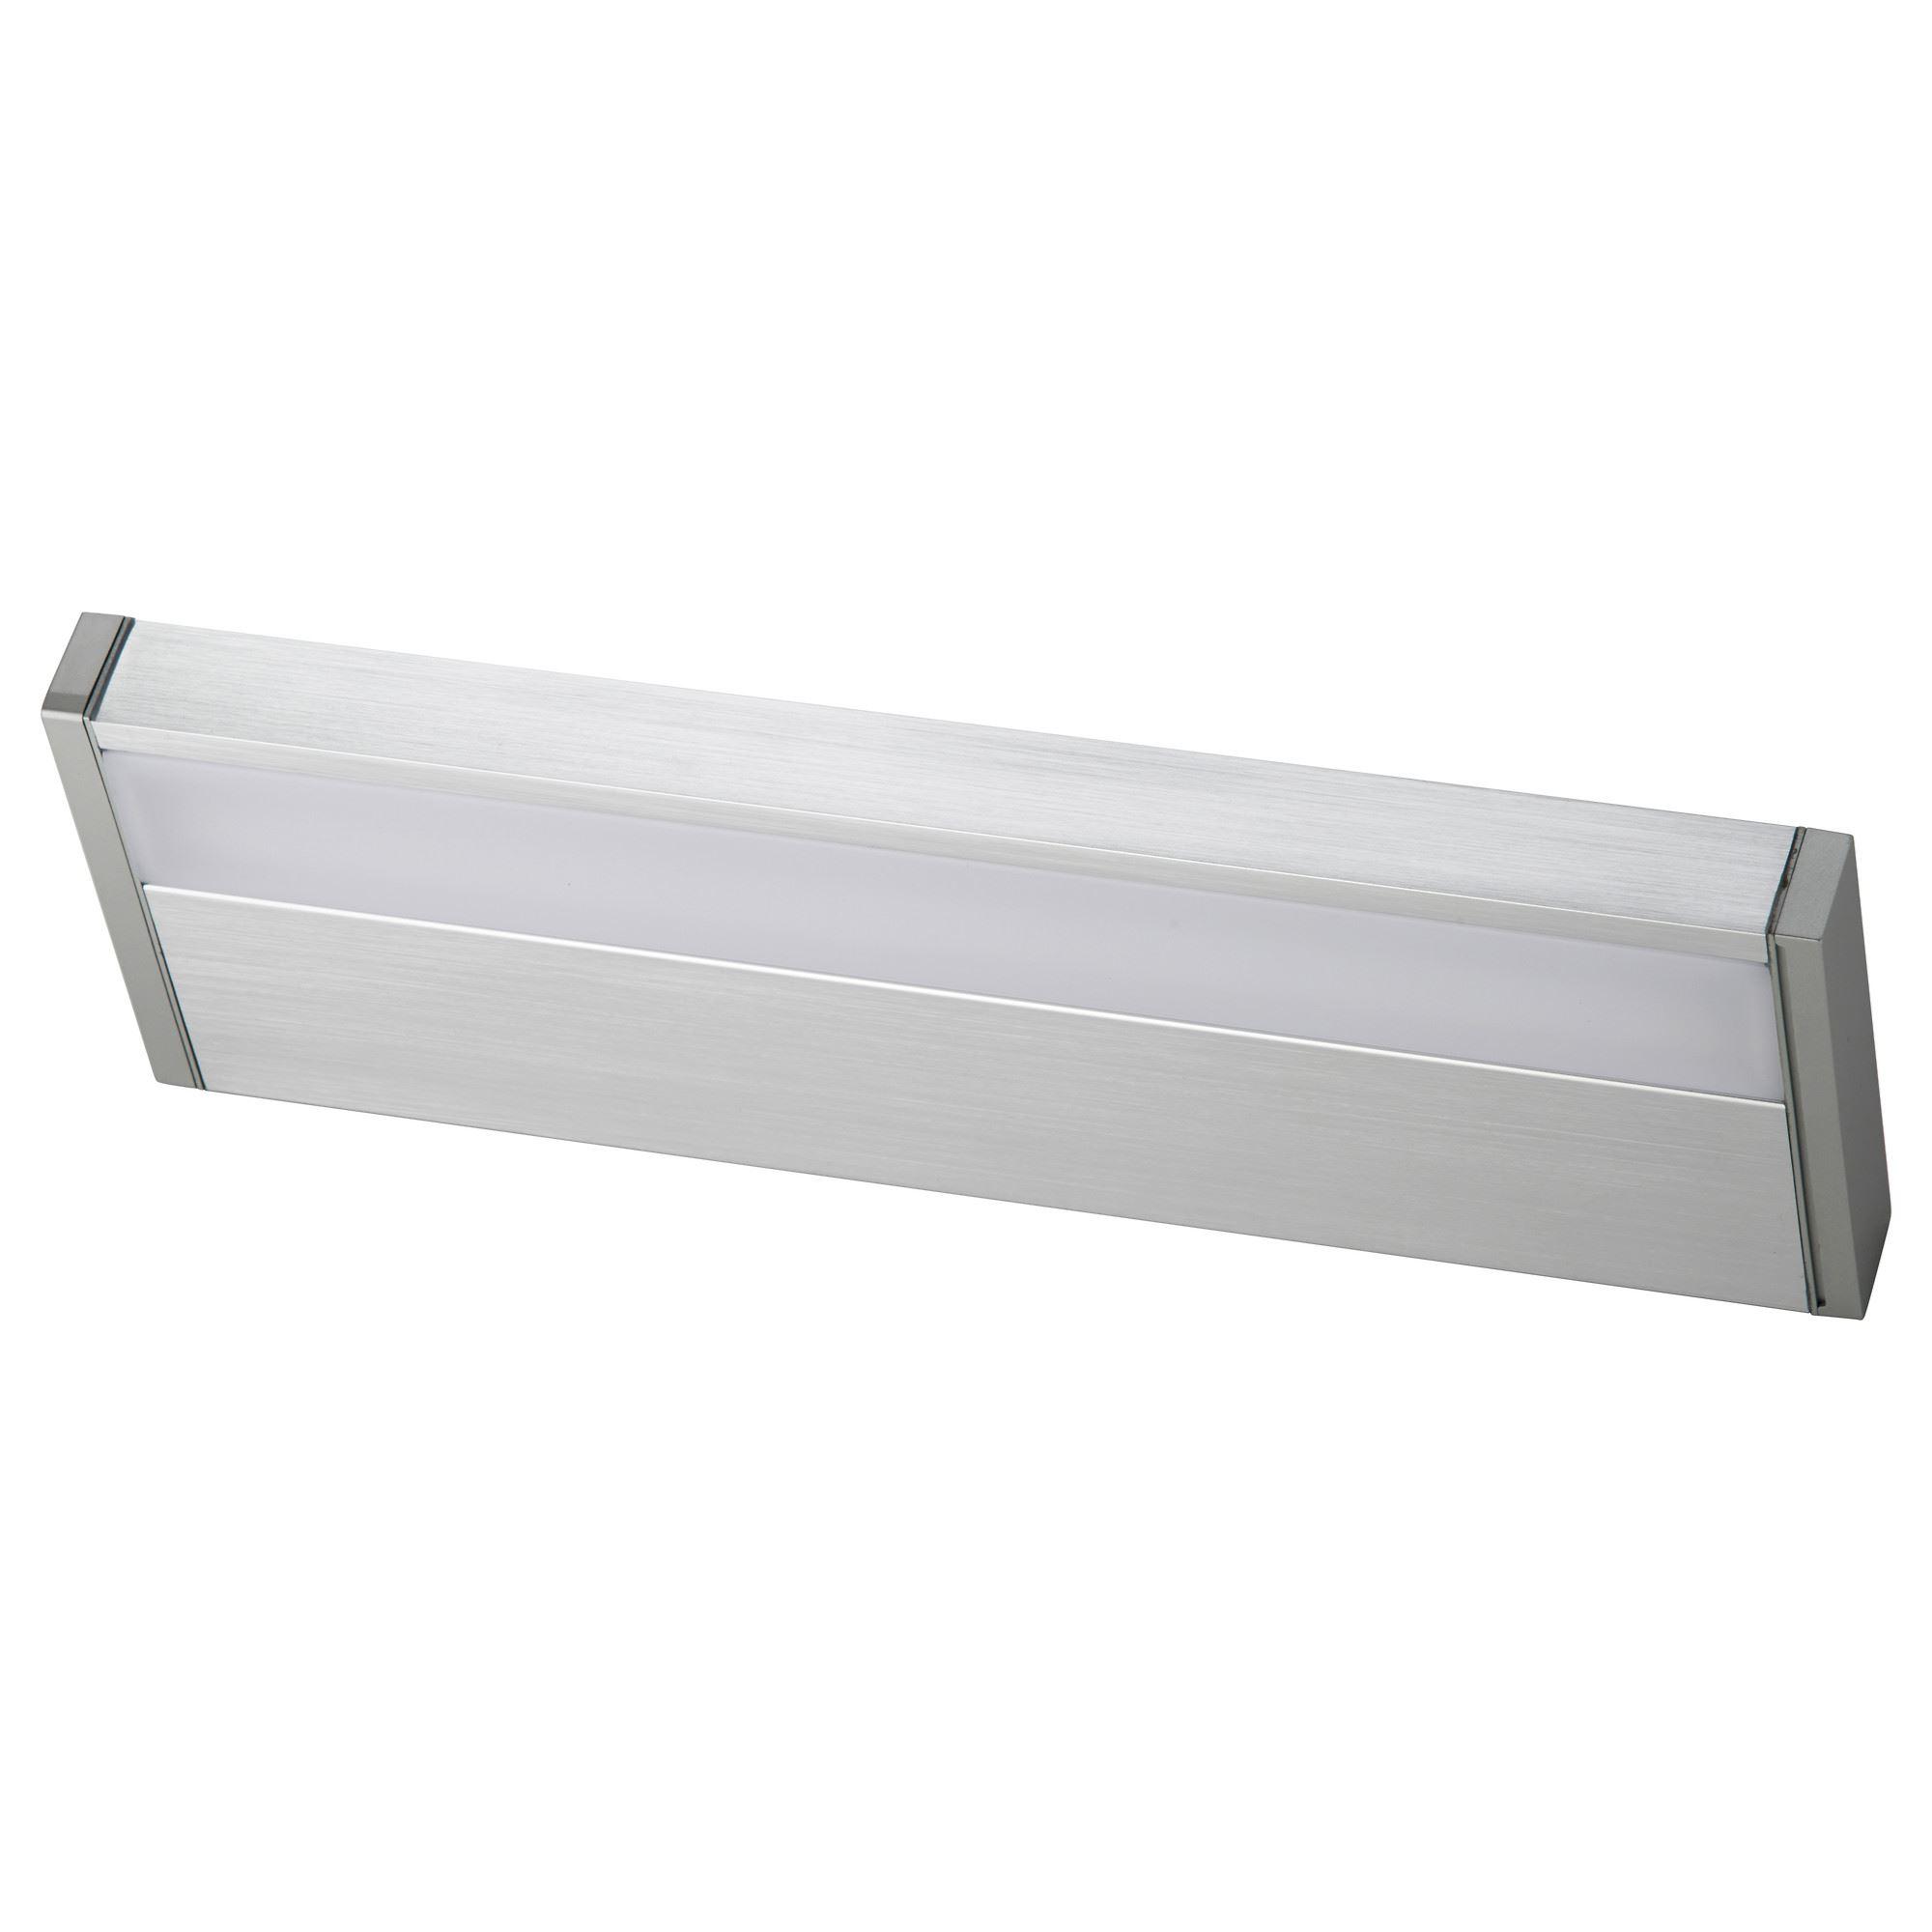 GODMORGON LED Wall Lamp Transparent 40 Cm   IKEA Lighting